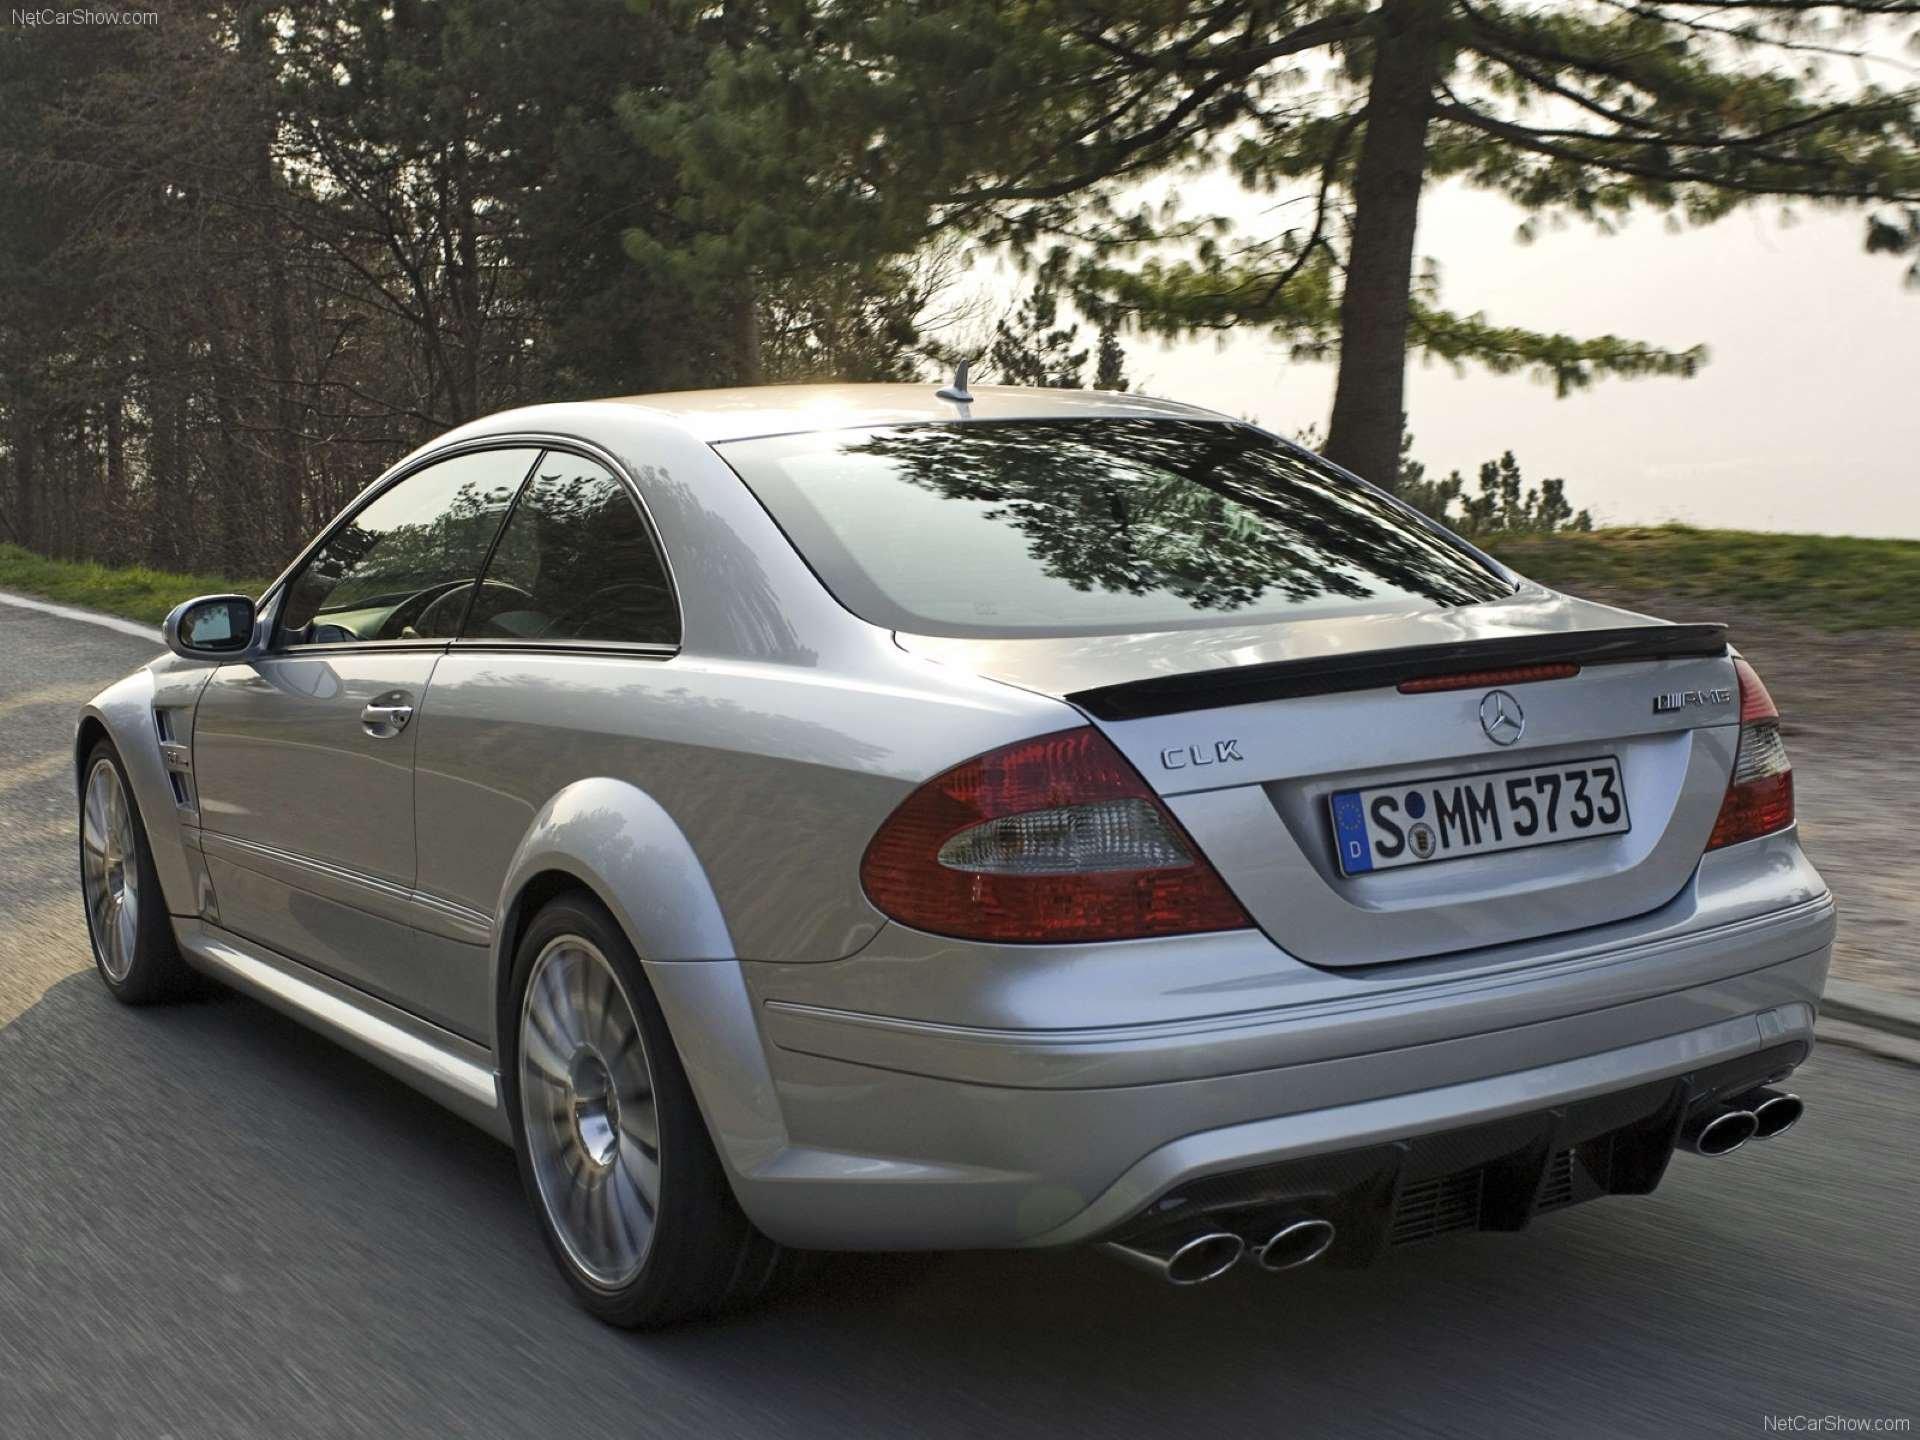 Pandemic Price Appreciation Mercedes-Benz W209 CLK63 AMG Black Series rear